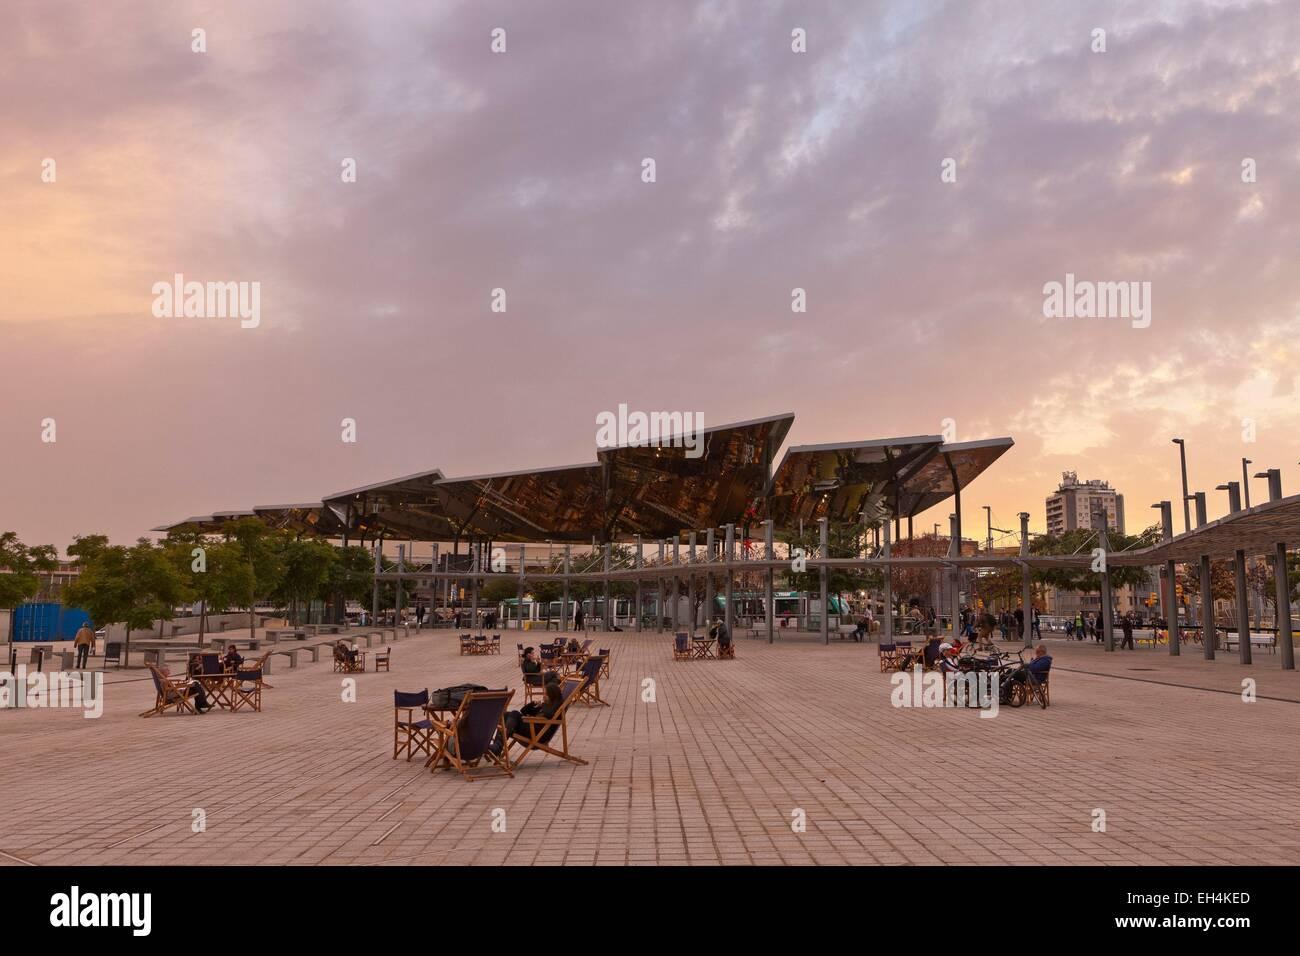 Spain, Catalonia, Barcelona, instead Glories, Mercat dels Encants (flea market) - Stock Image